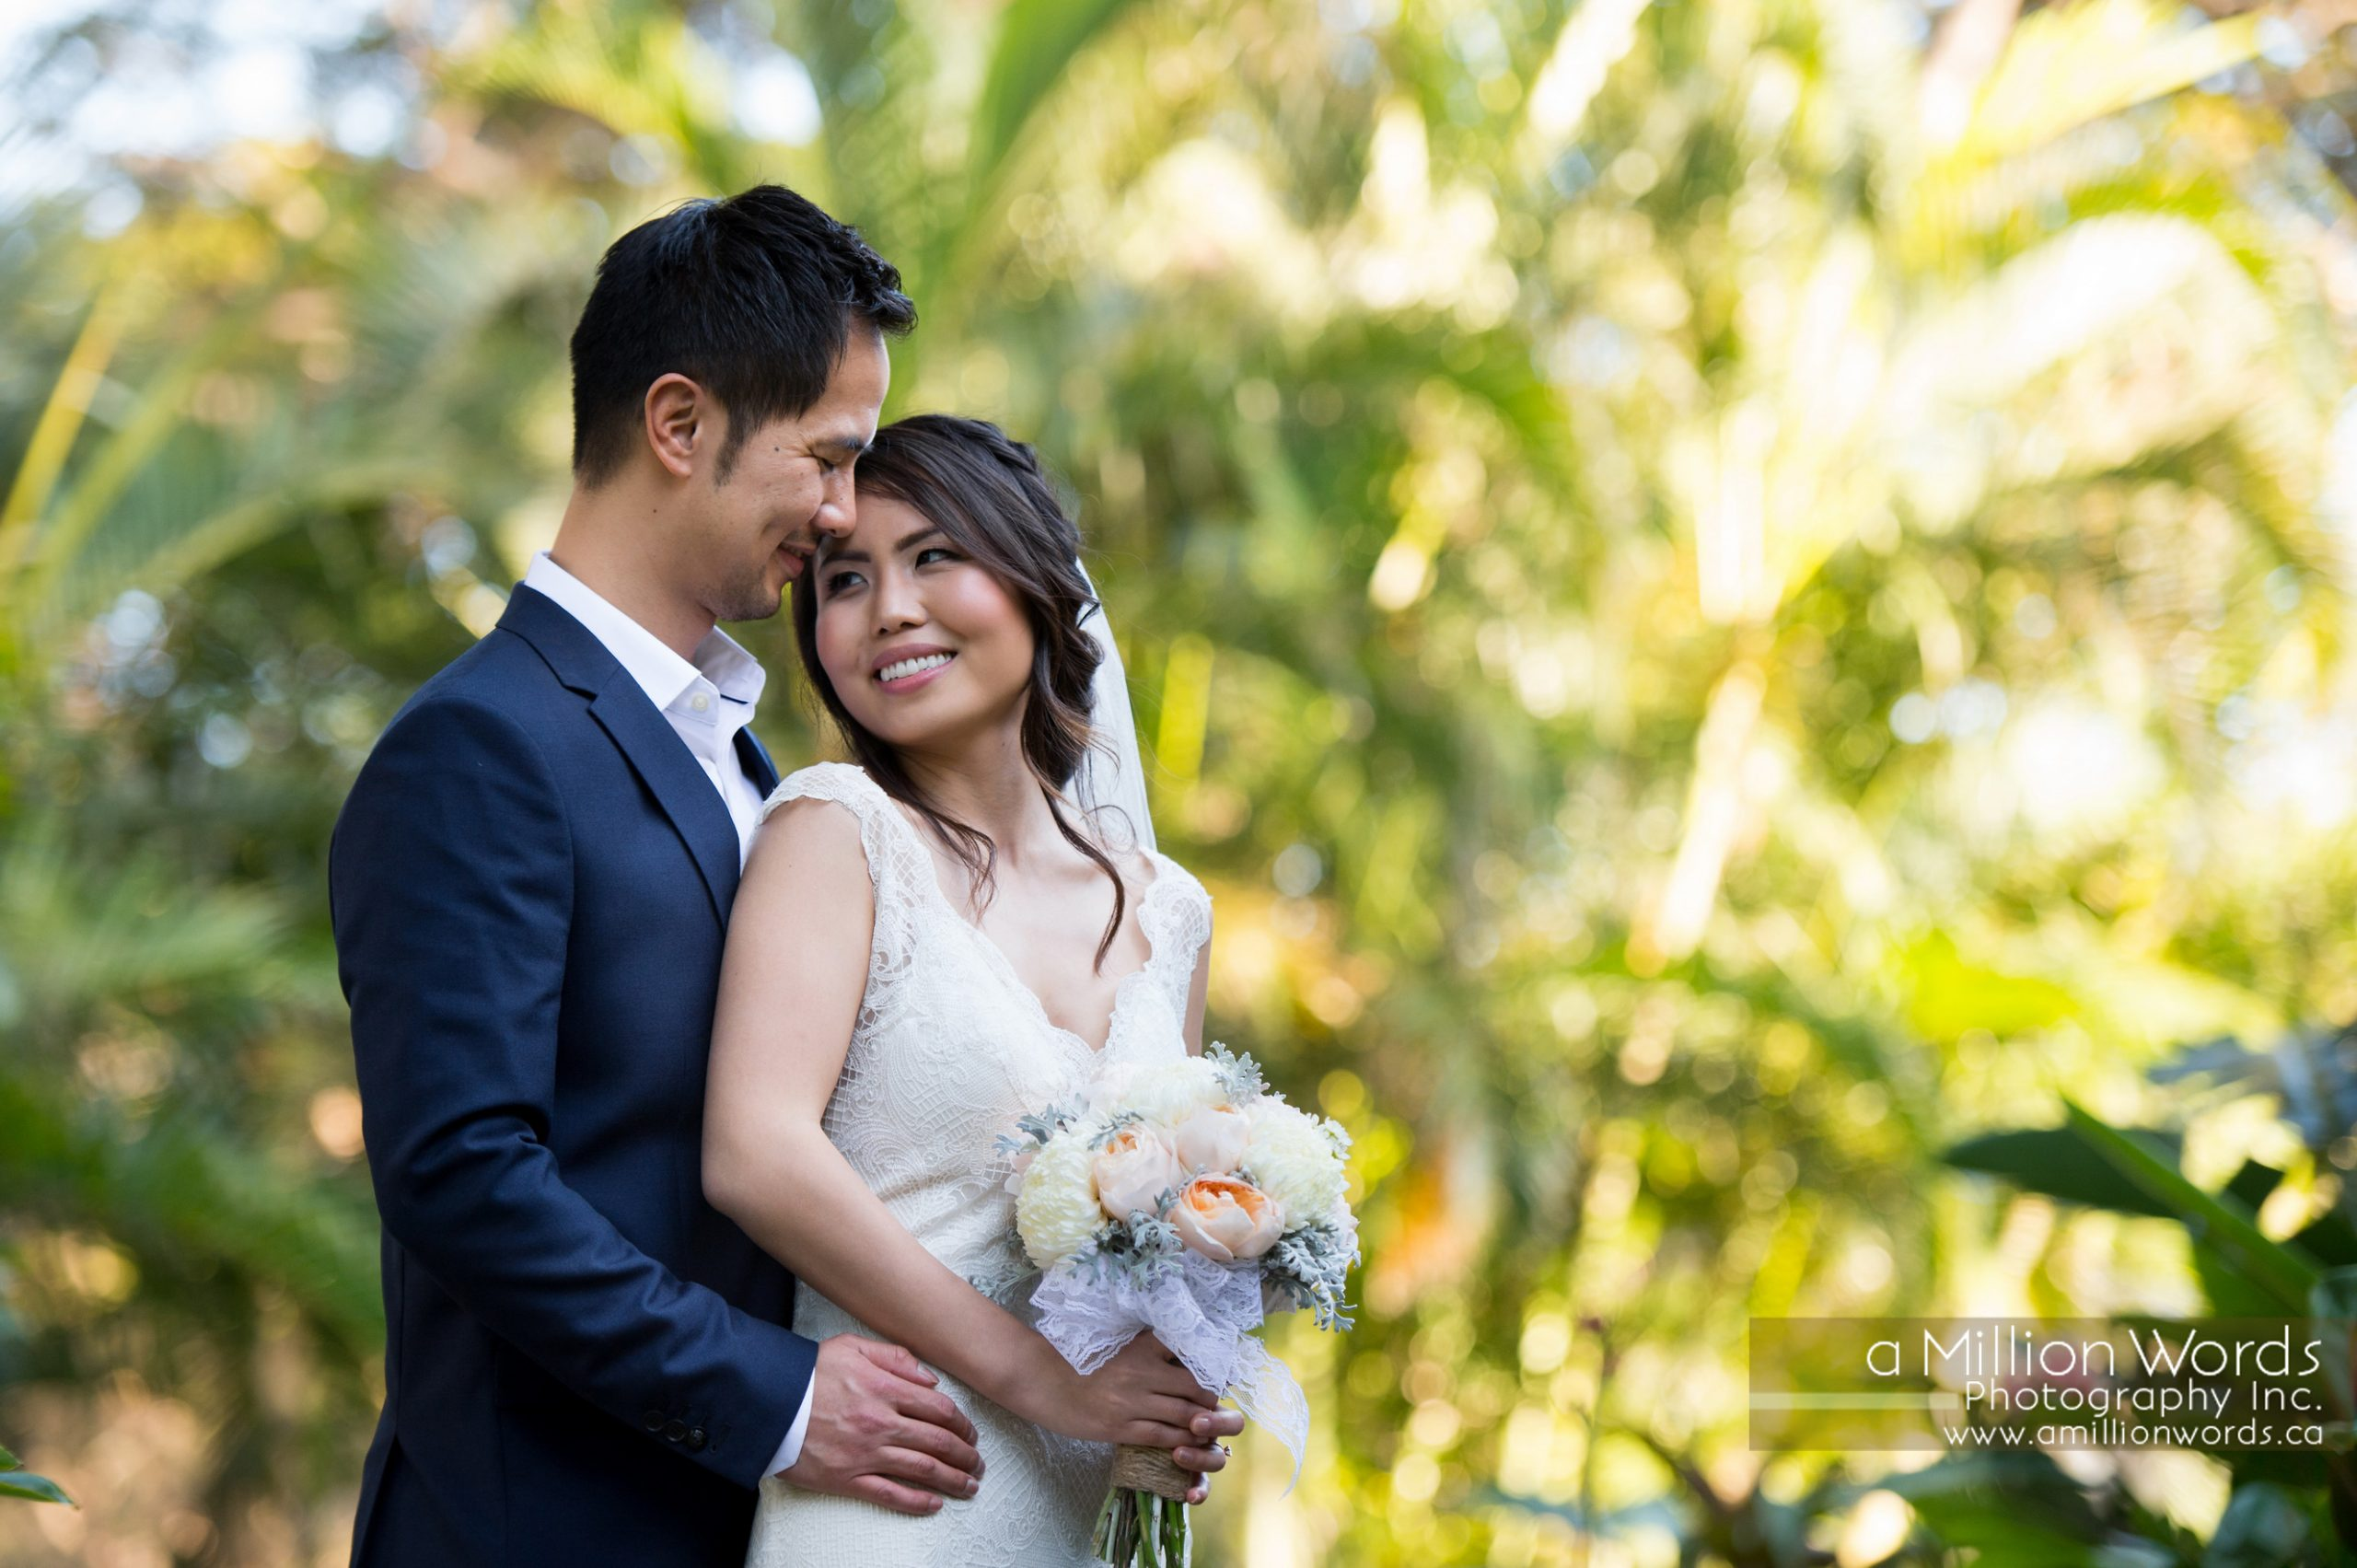 kw_destination_wedding_photography27